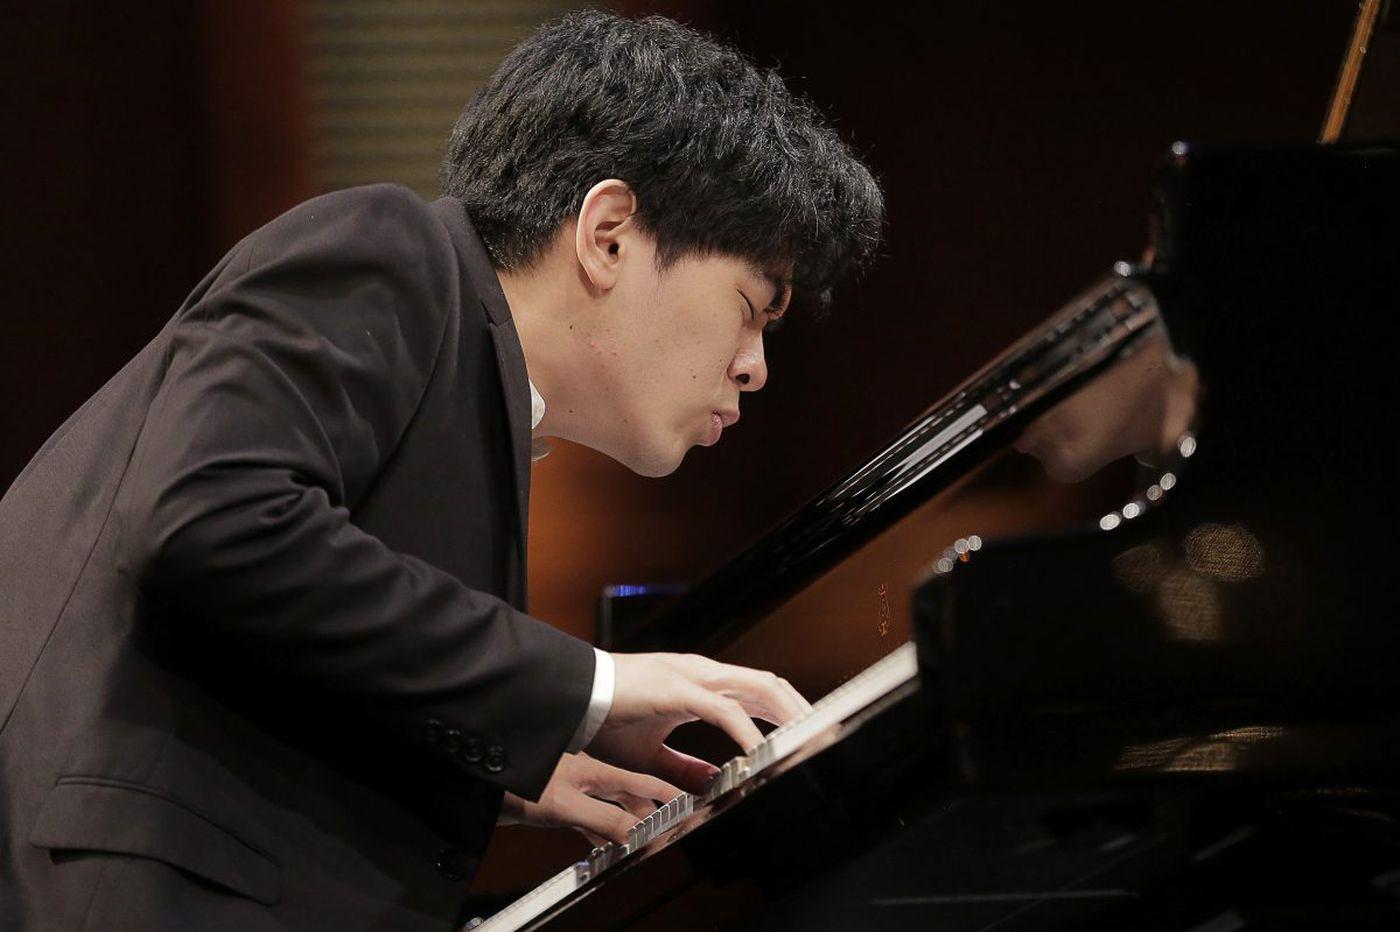 Curtis pianist makes it to Van Cliburn finals